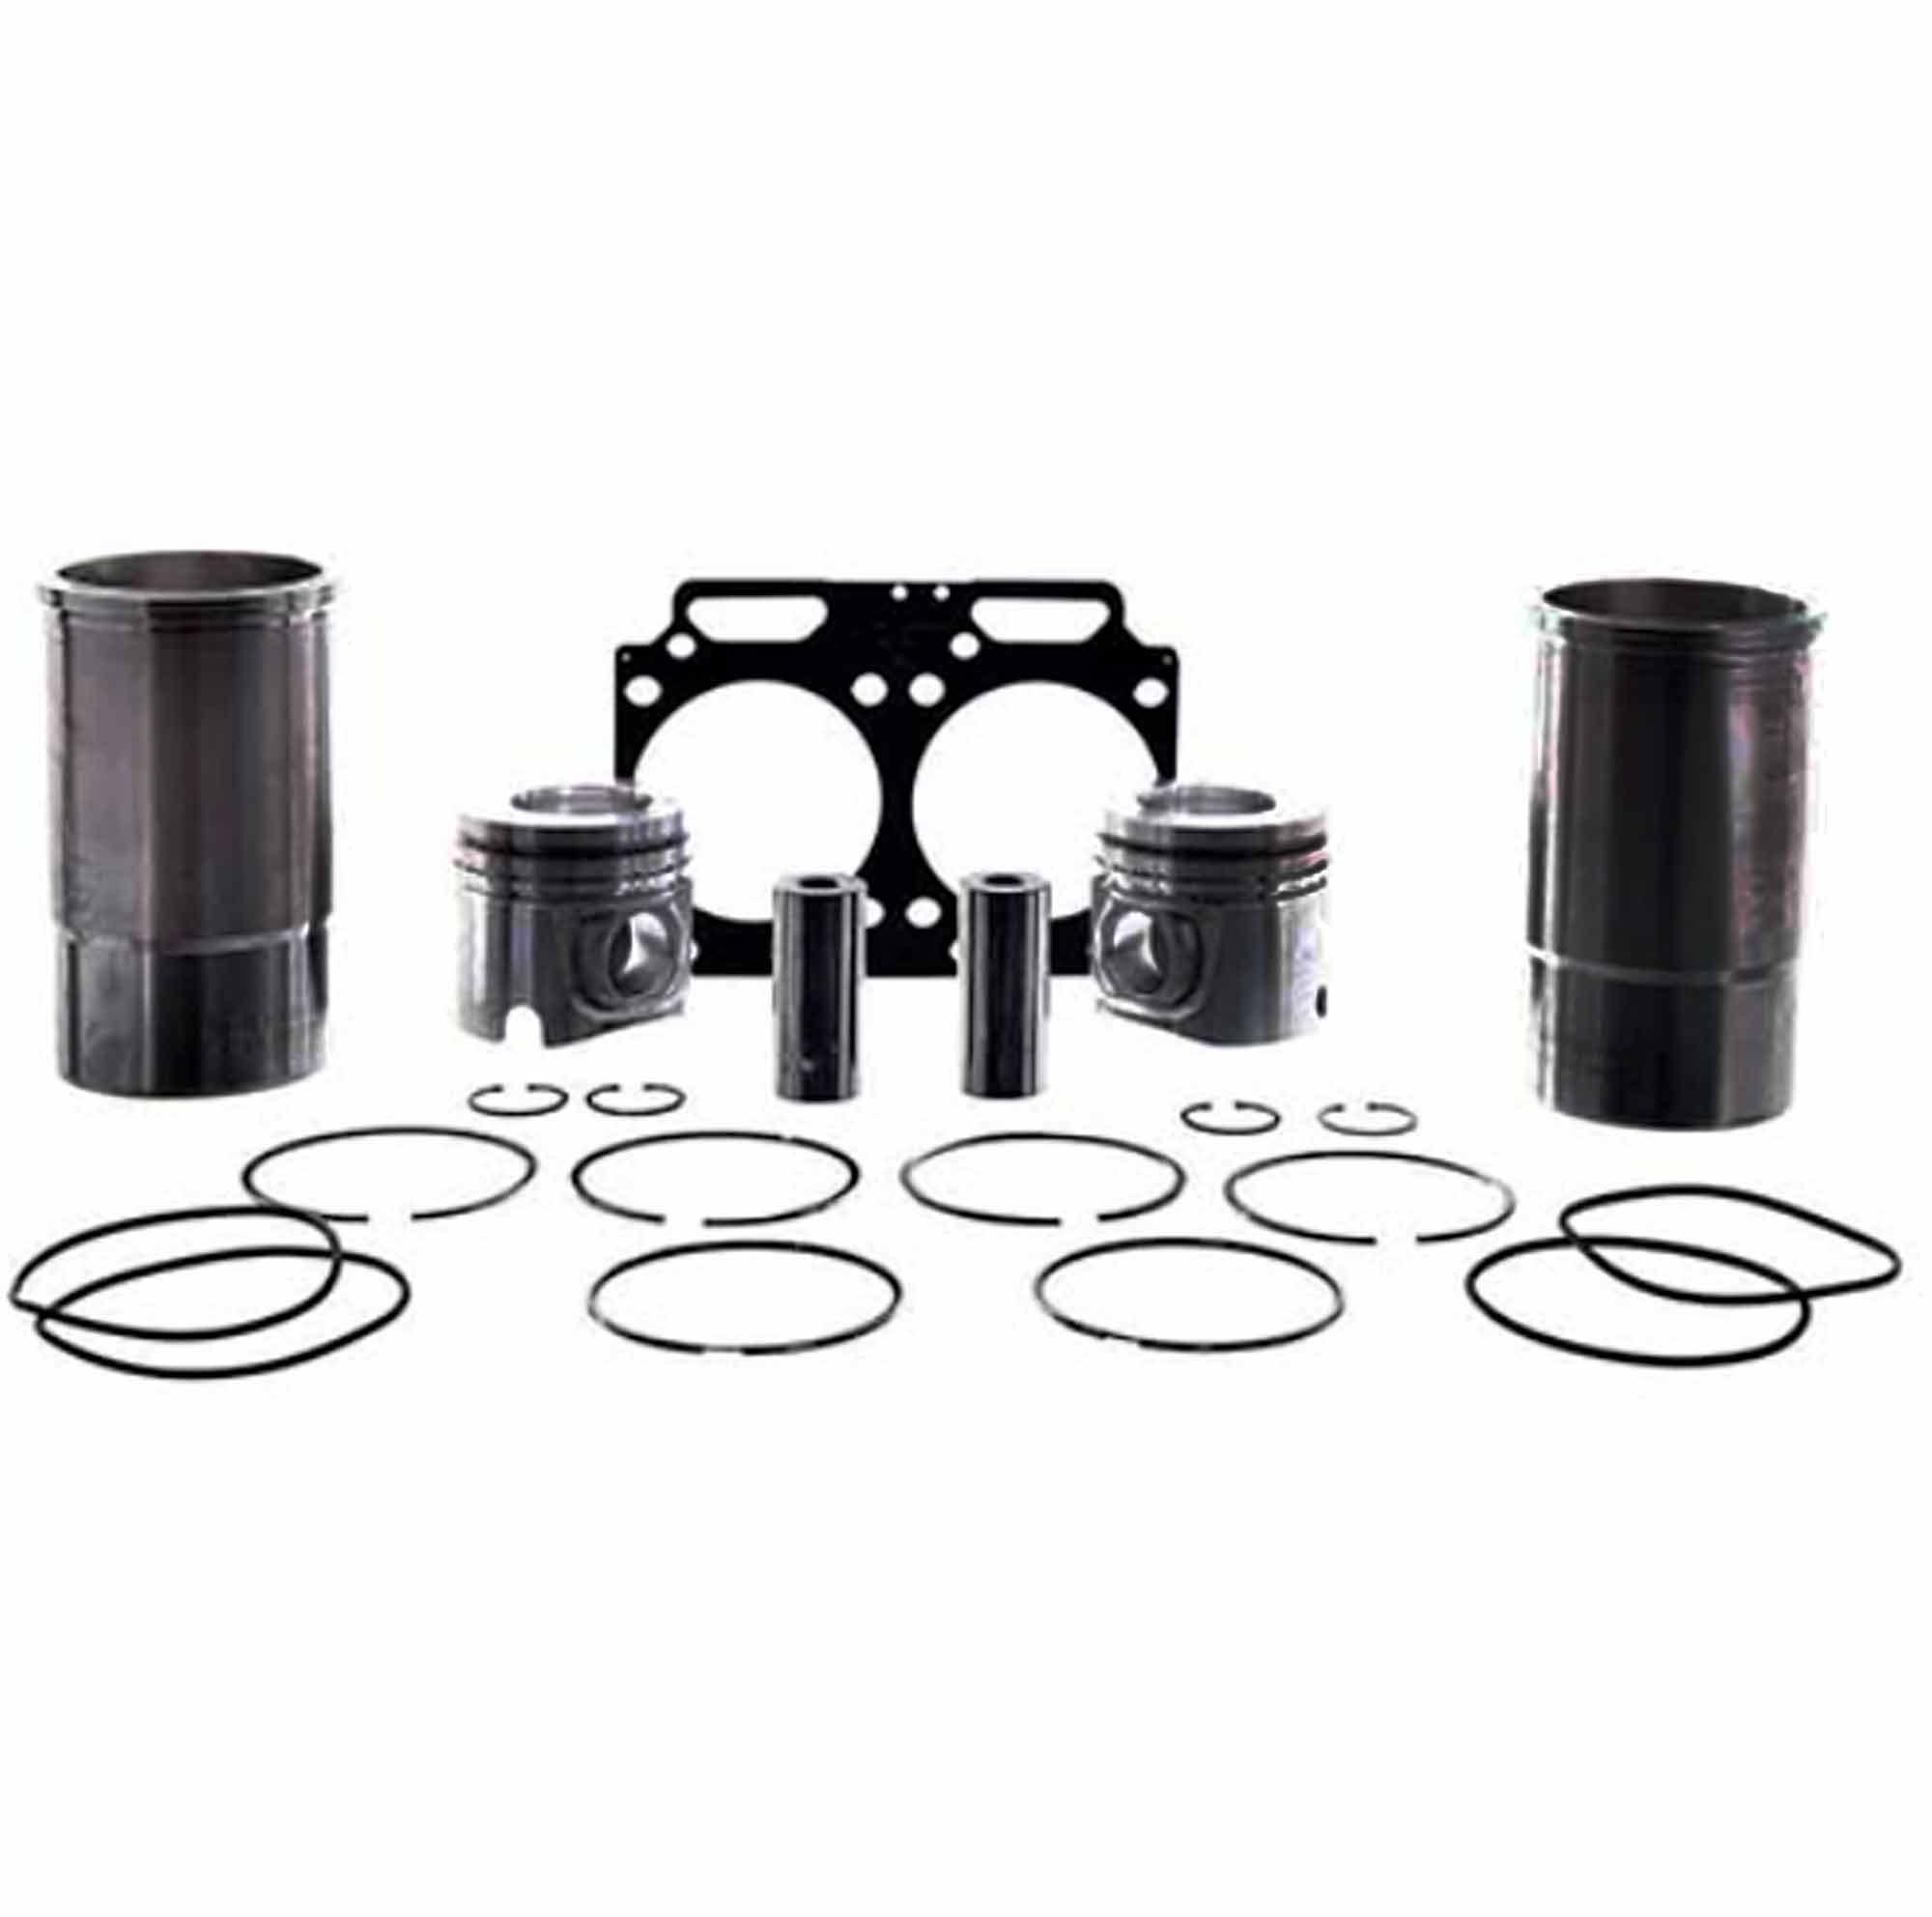 961280190148 - Kit de reparo para 2 cilindros - Master Kit